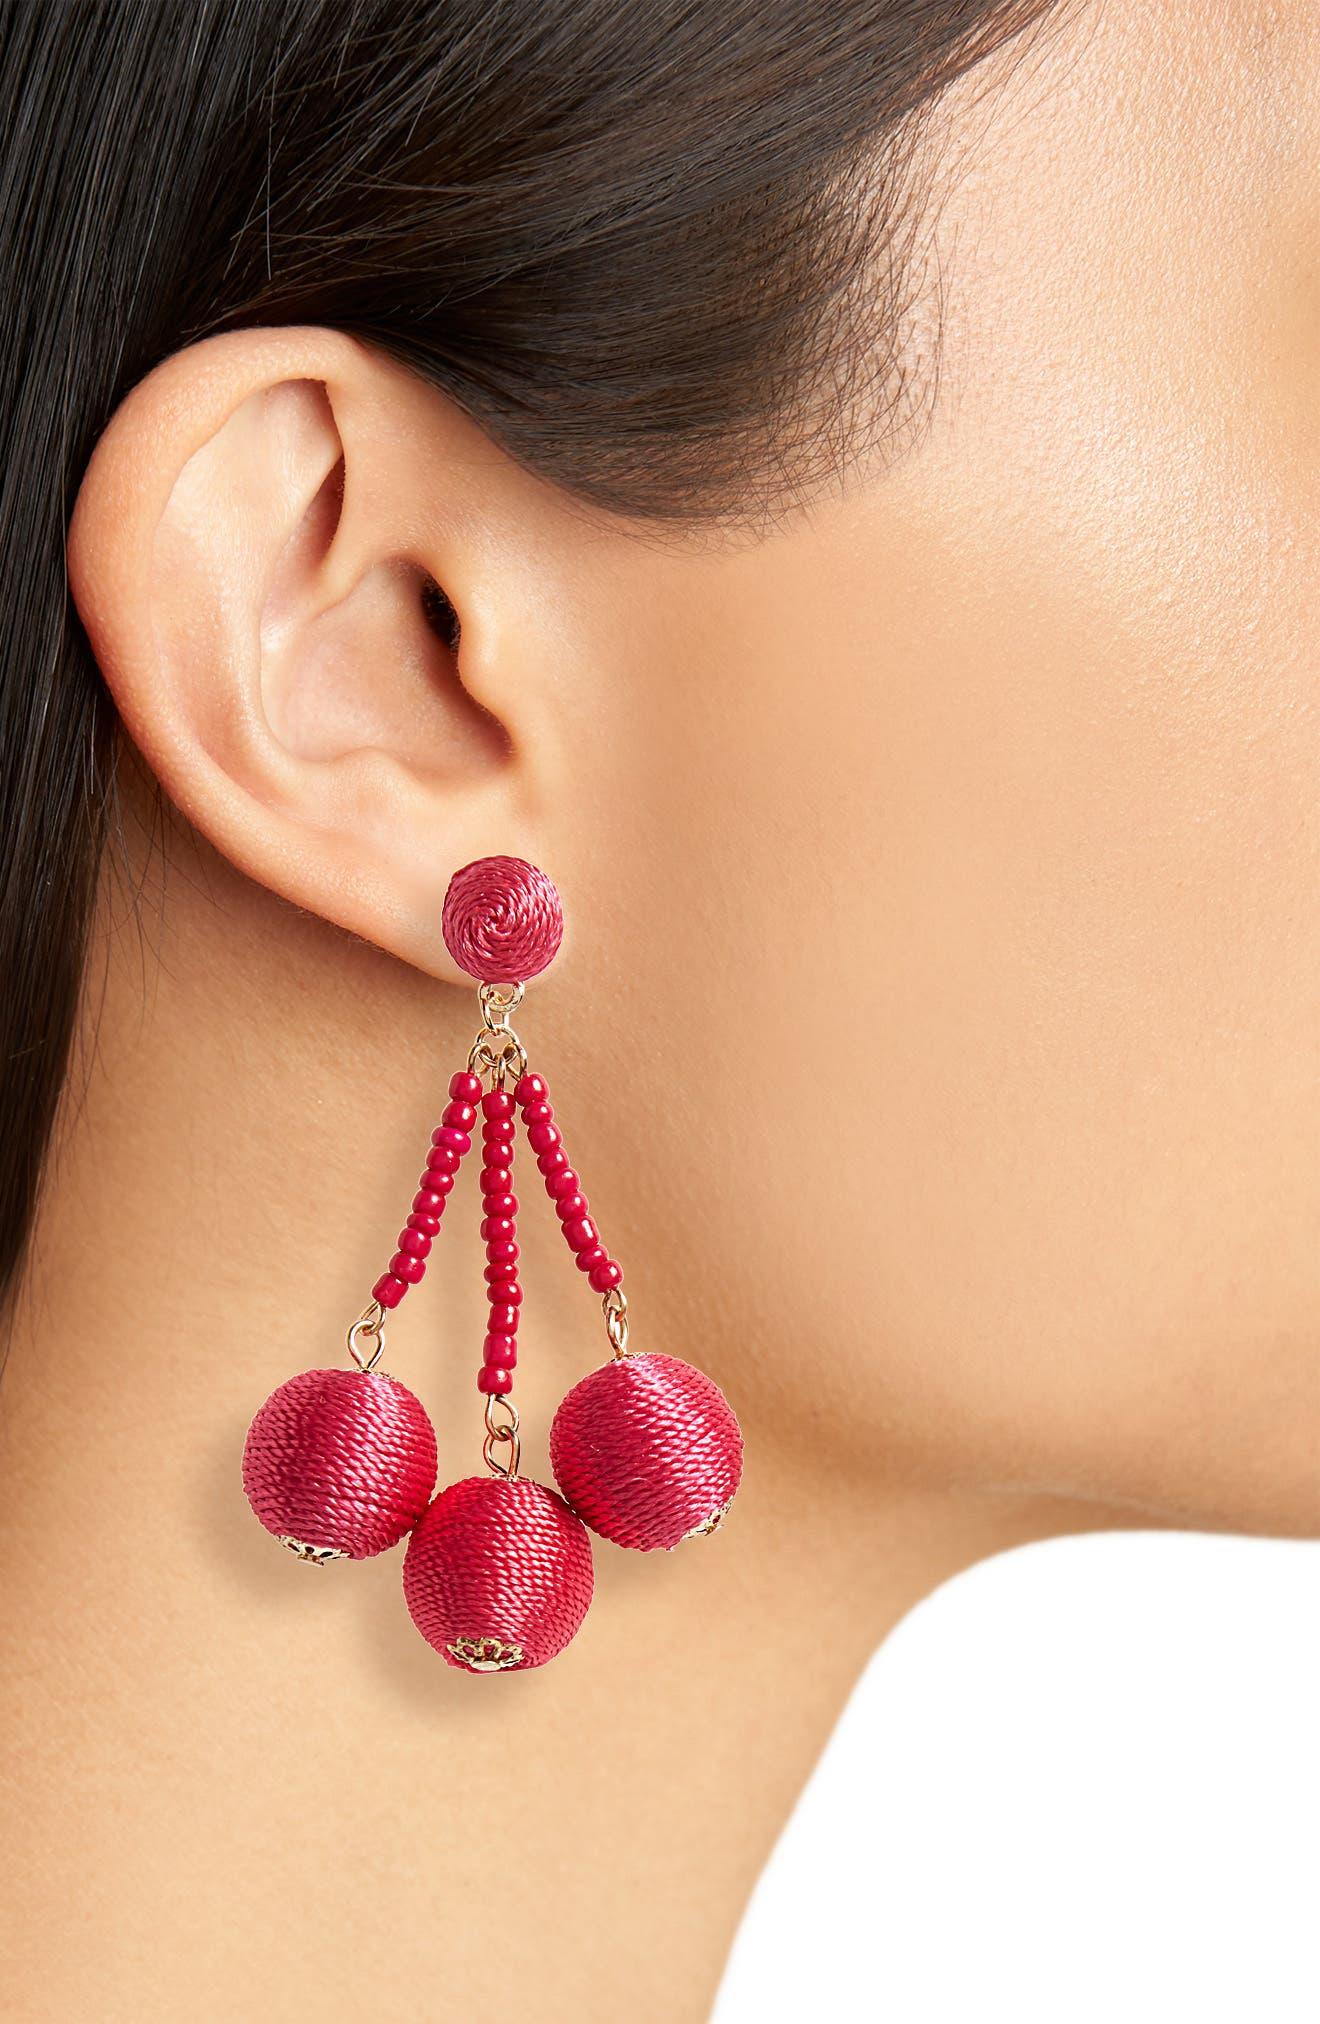 Sphere Drop Earrings,                             Alternate thumbnail 2, color,                             650